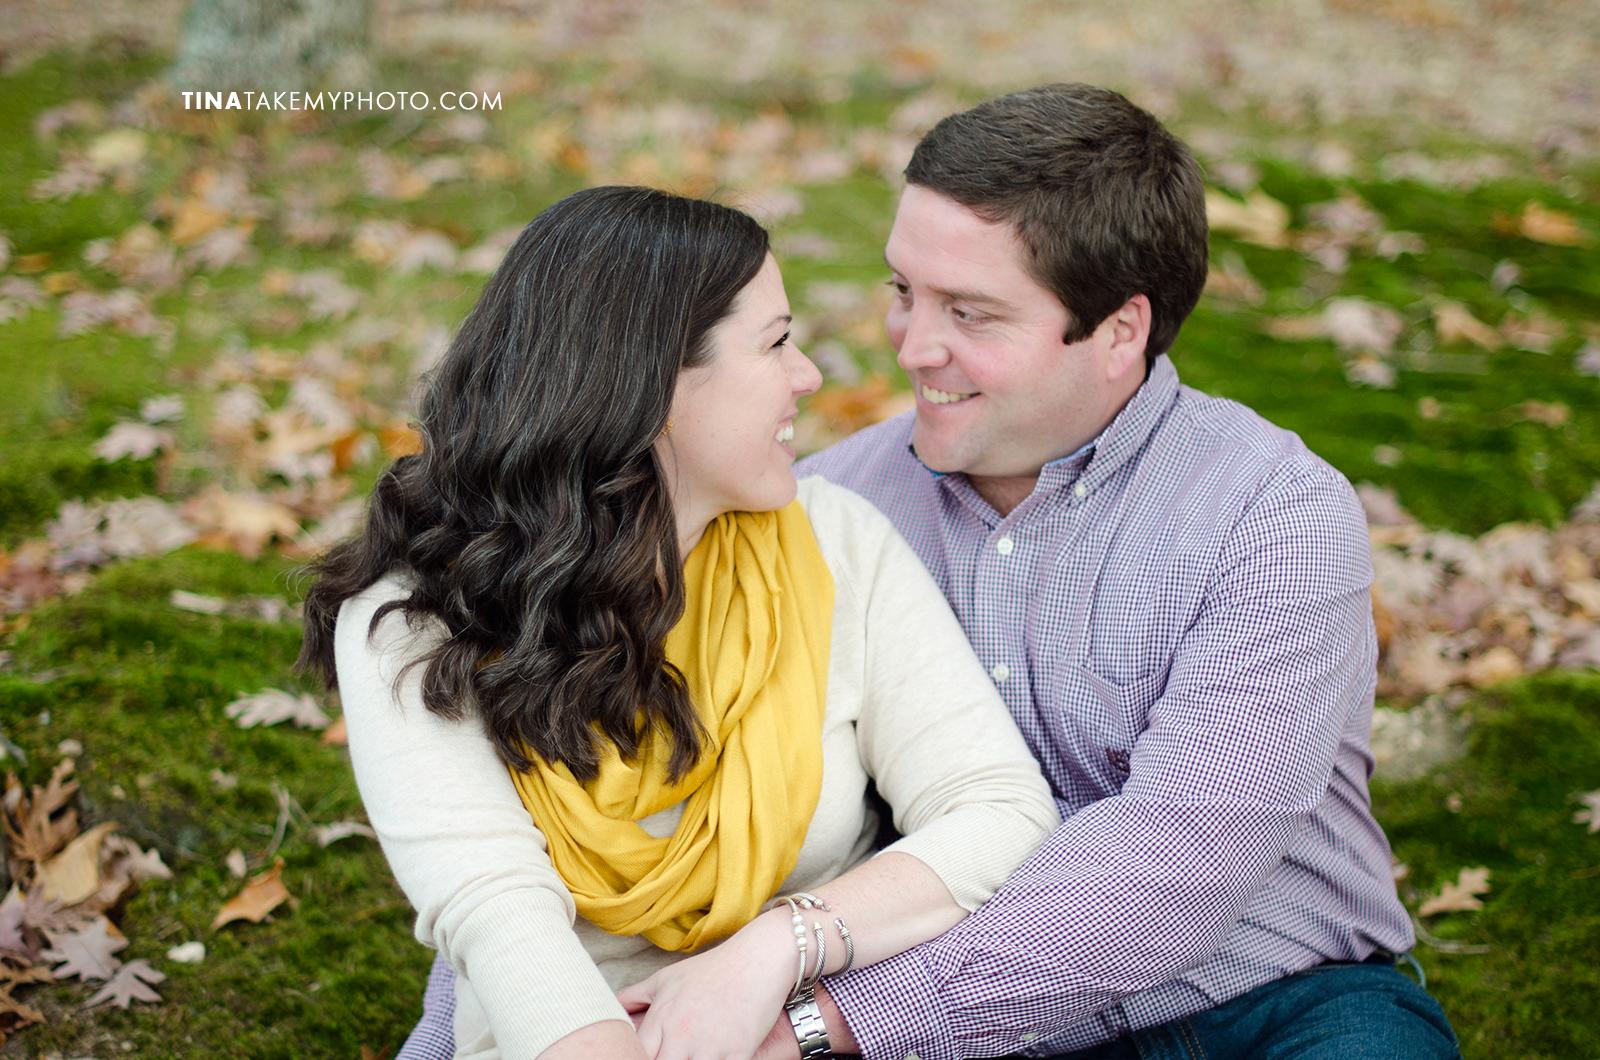 Midlothian-Swift-Creek-Woodlake-Engagement-Photographer-Fall-Woods (7)